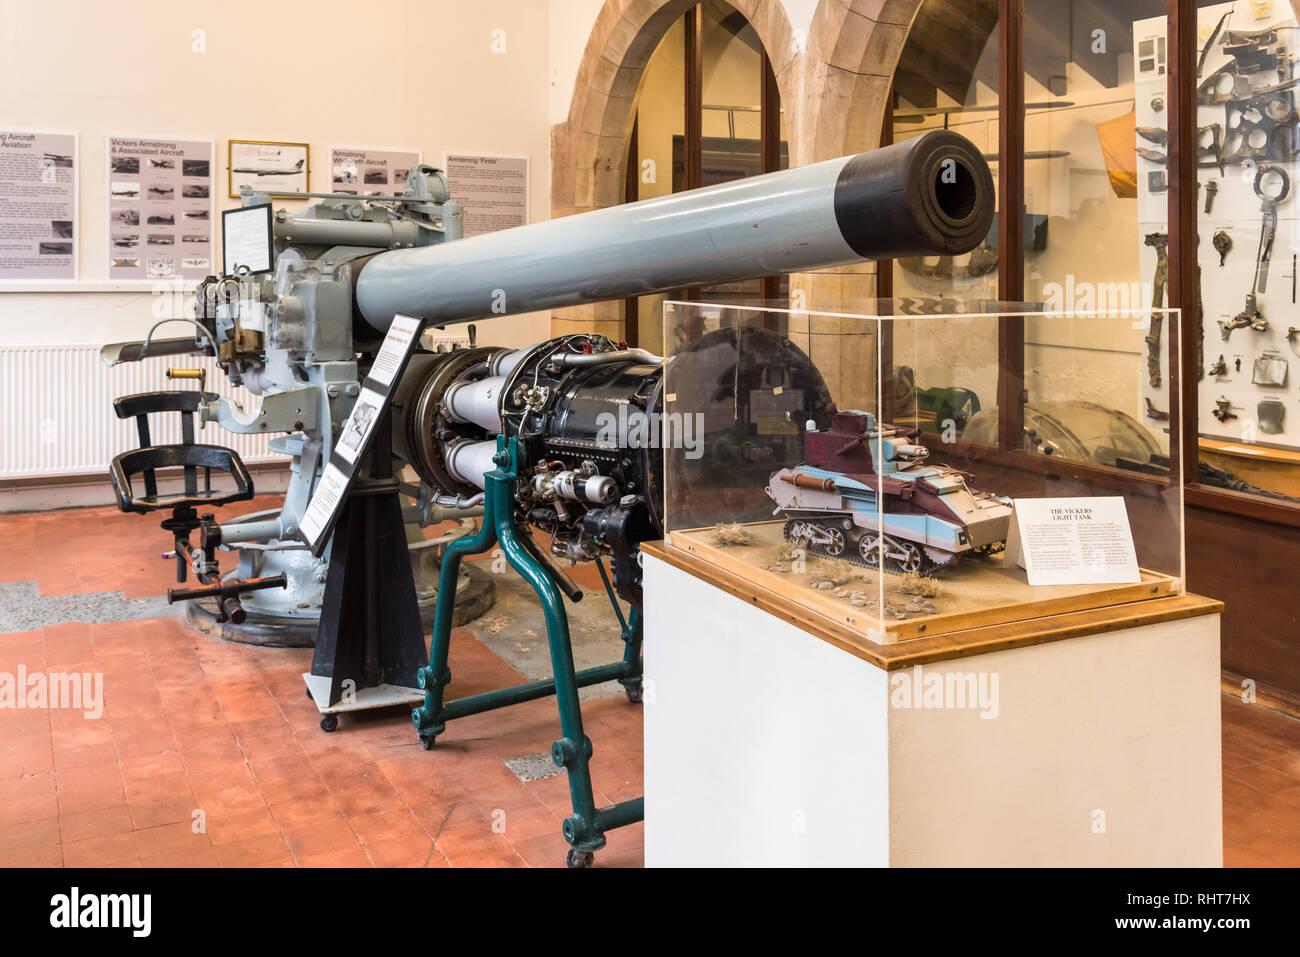 Armstrong & Aviation Museum, Bamburgh Castle, Northumberland, UK - Stock Image